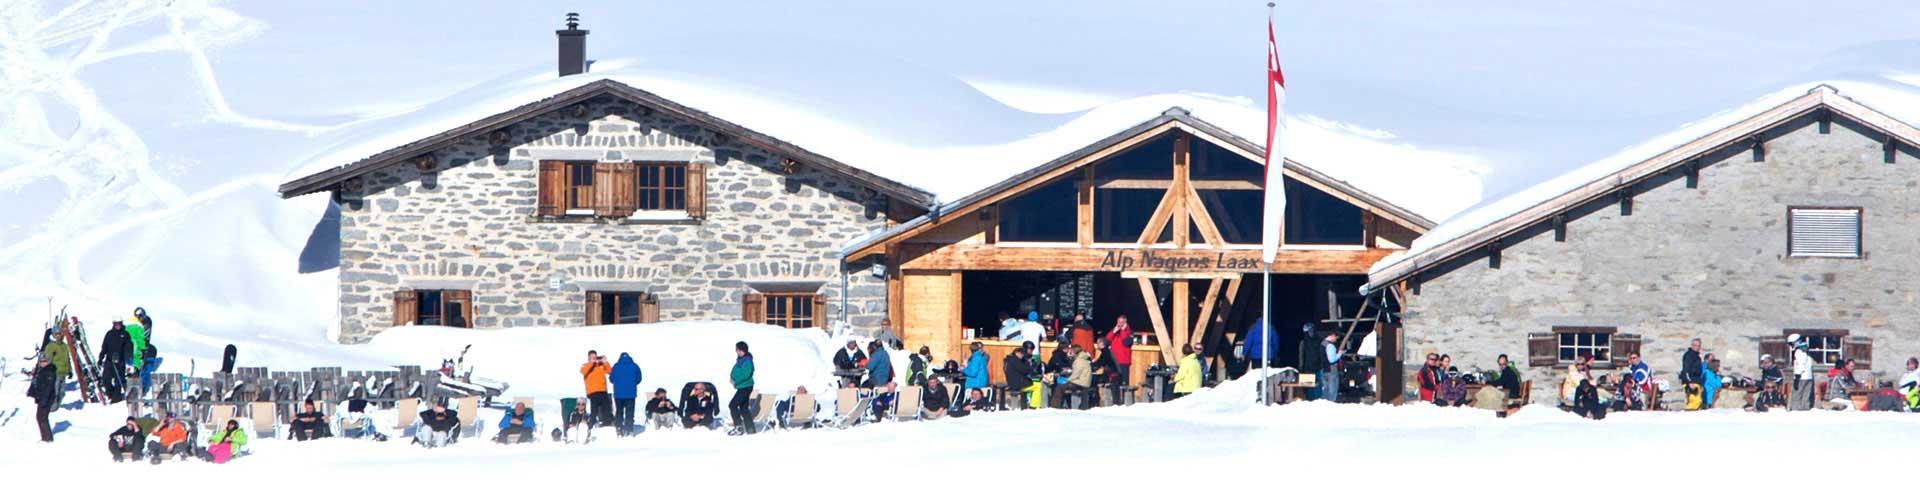 Skiing Snowboarding